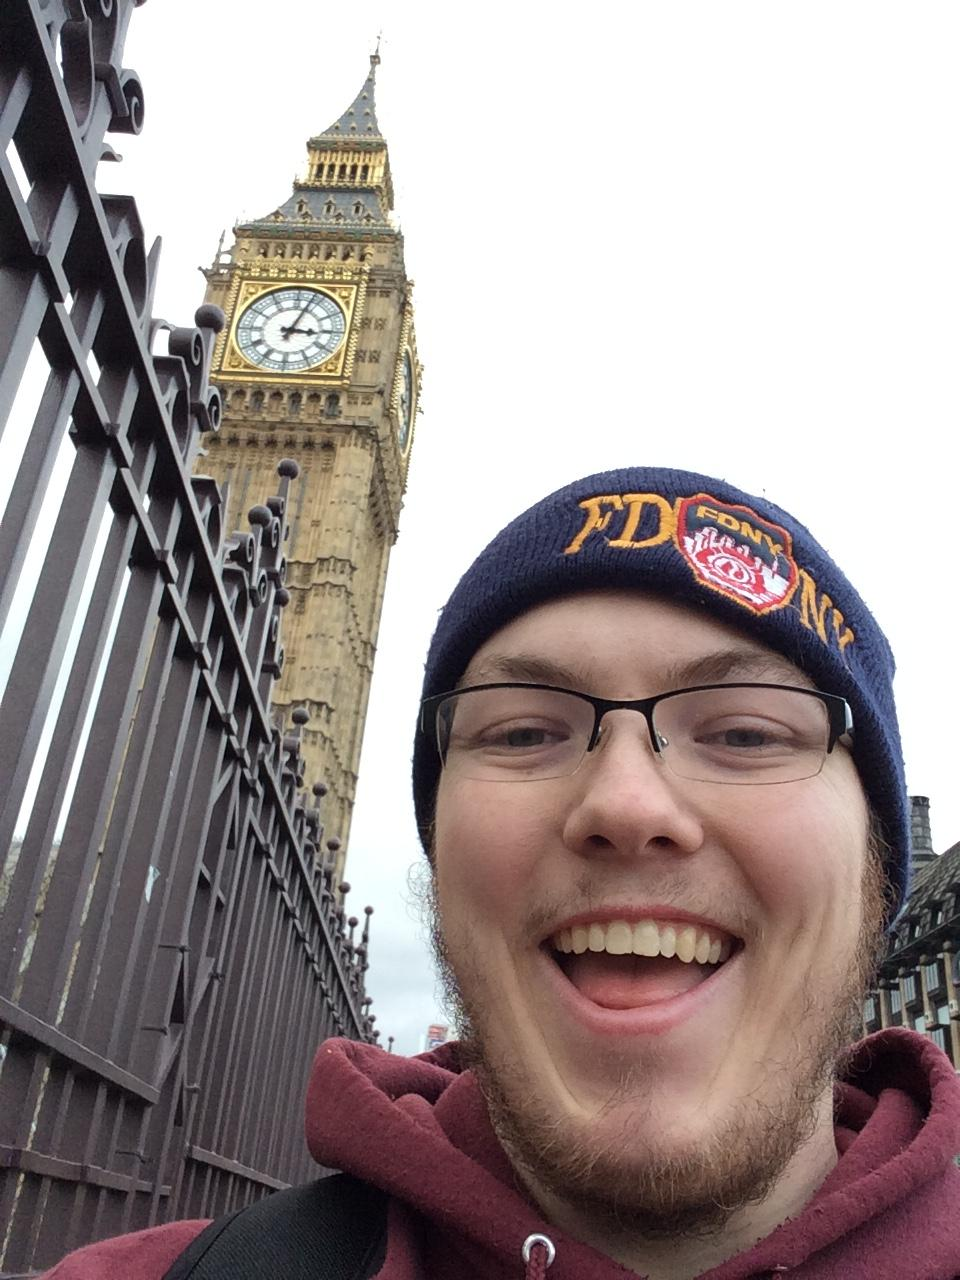 CAPAStudyAbroad_Dublin_Fall2015_From_Jeff_Vinton_-_Dublin_Student_Visiting_London.jpg